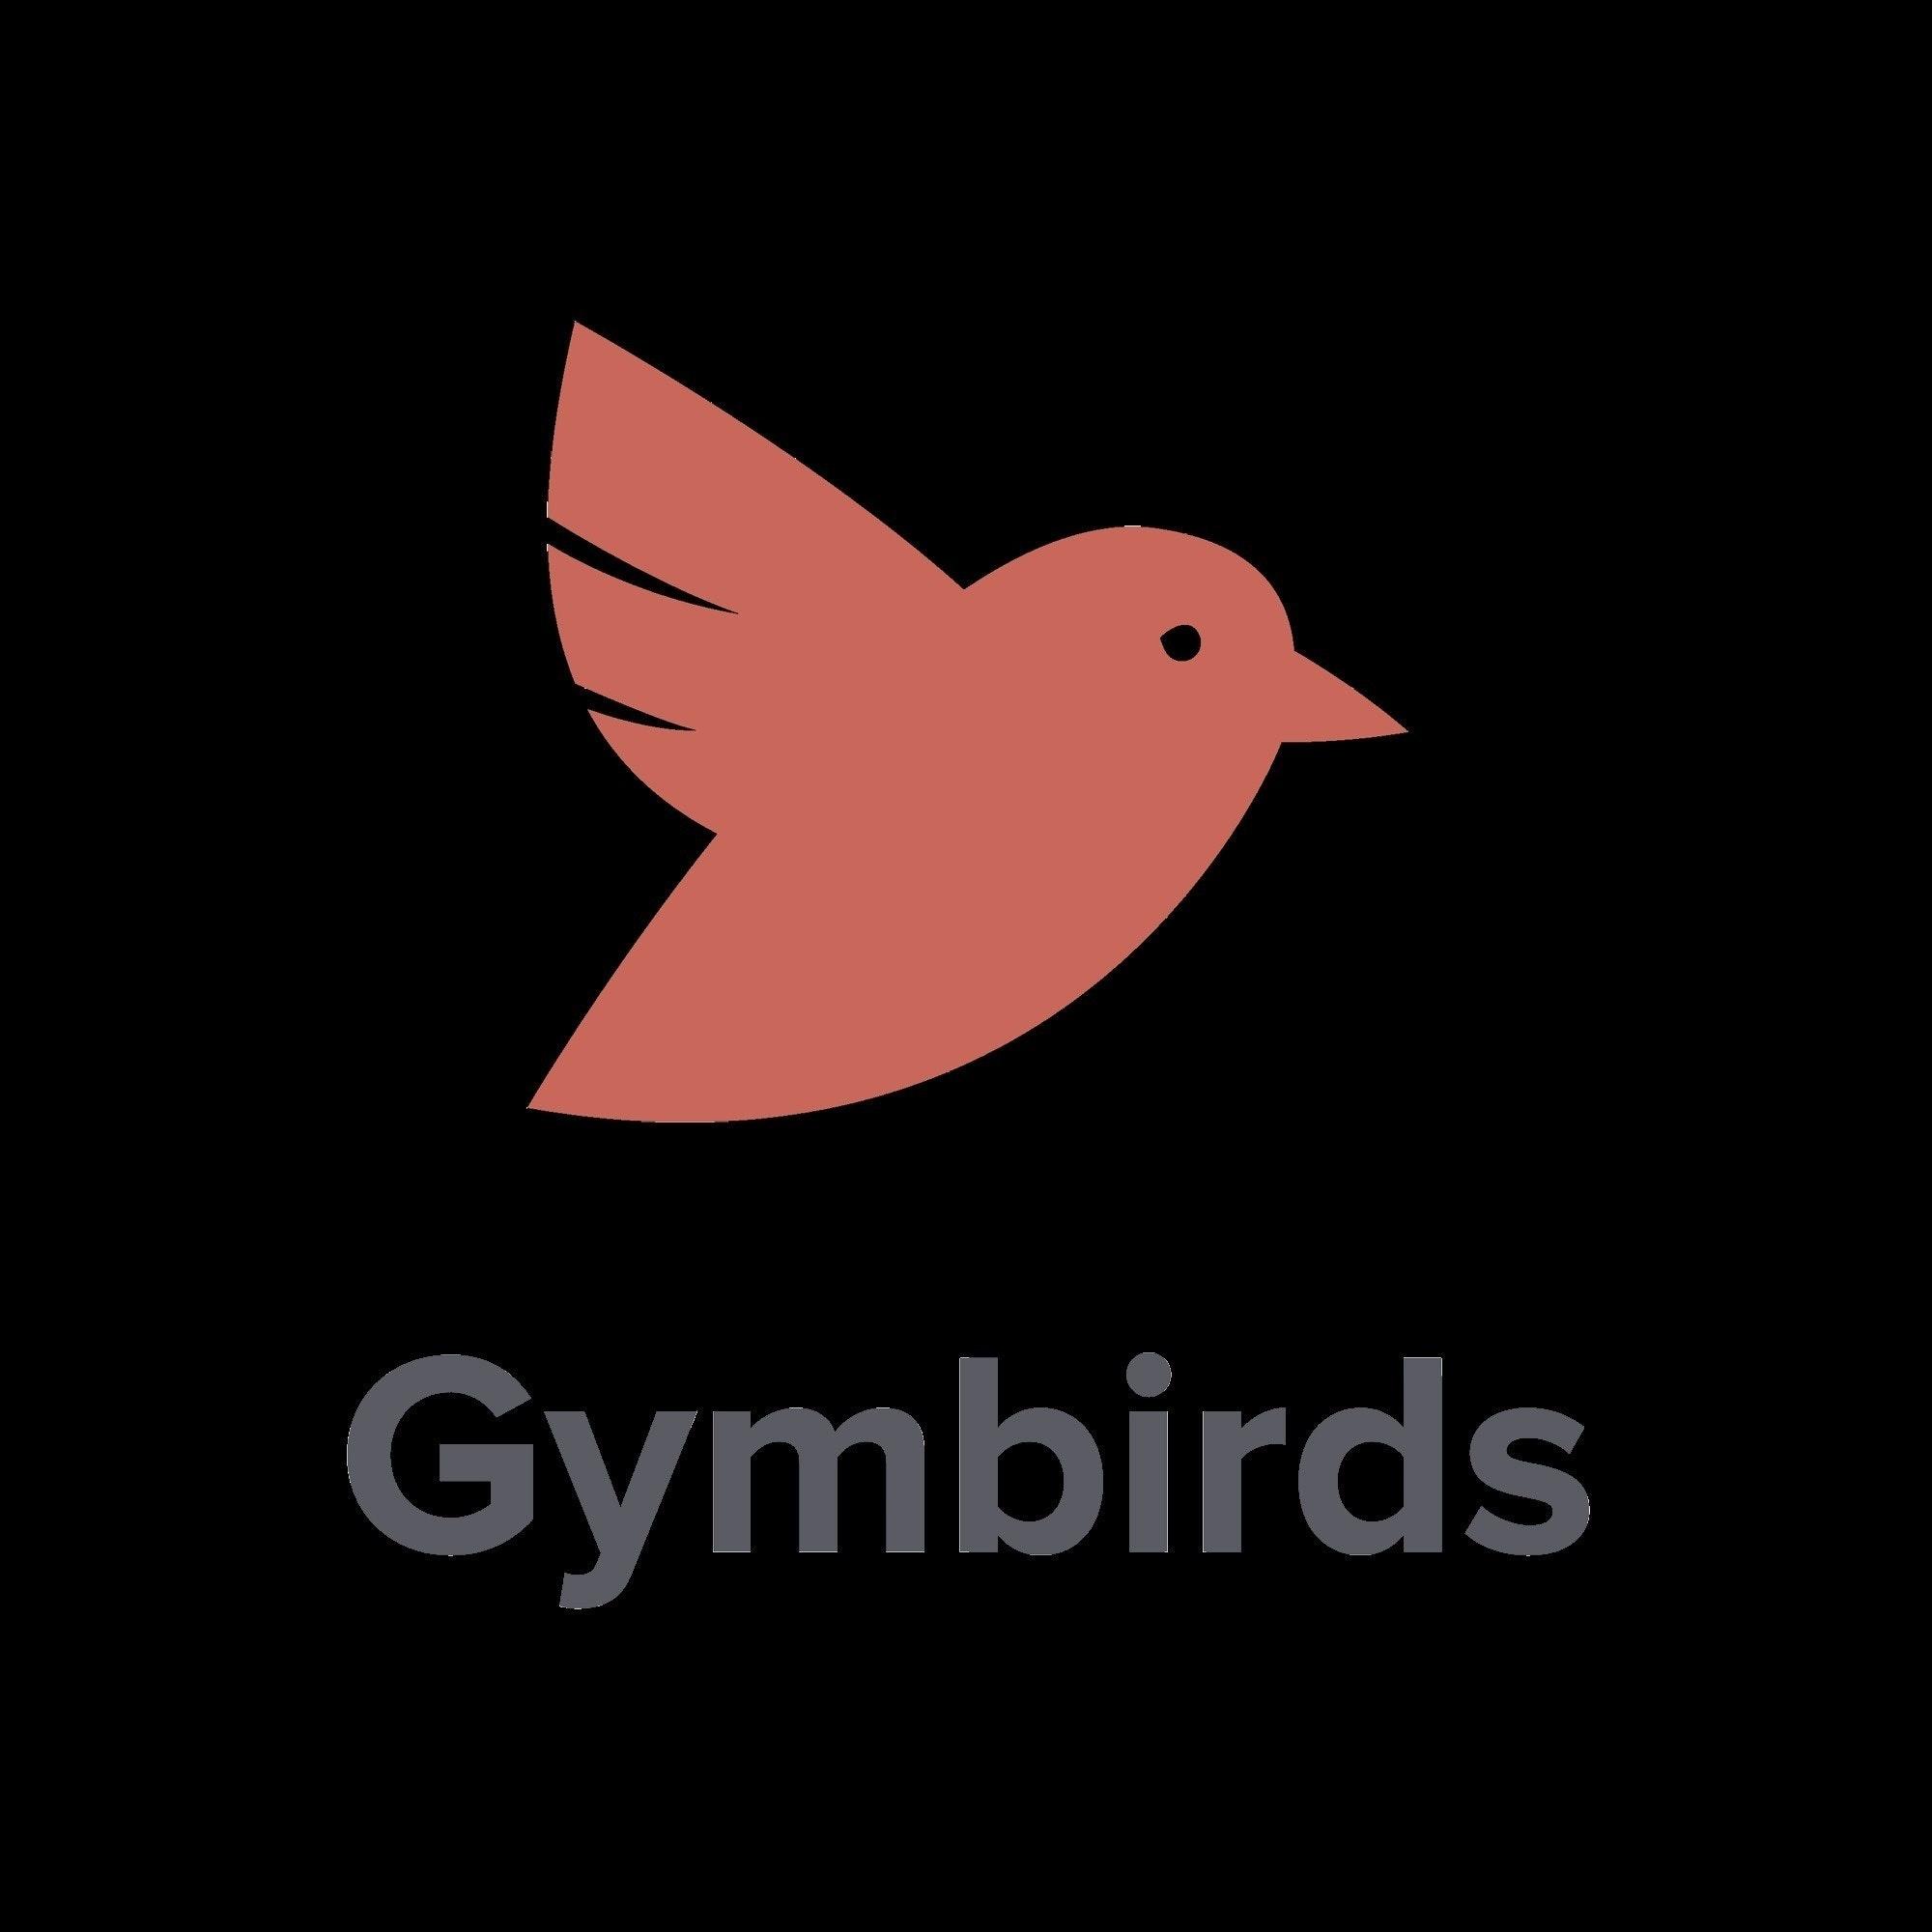 Gymbirds